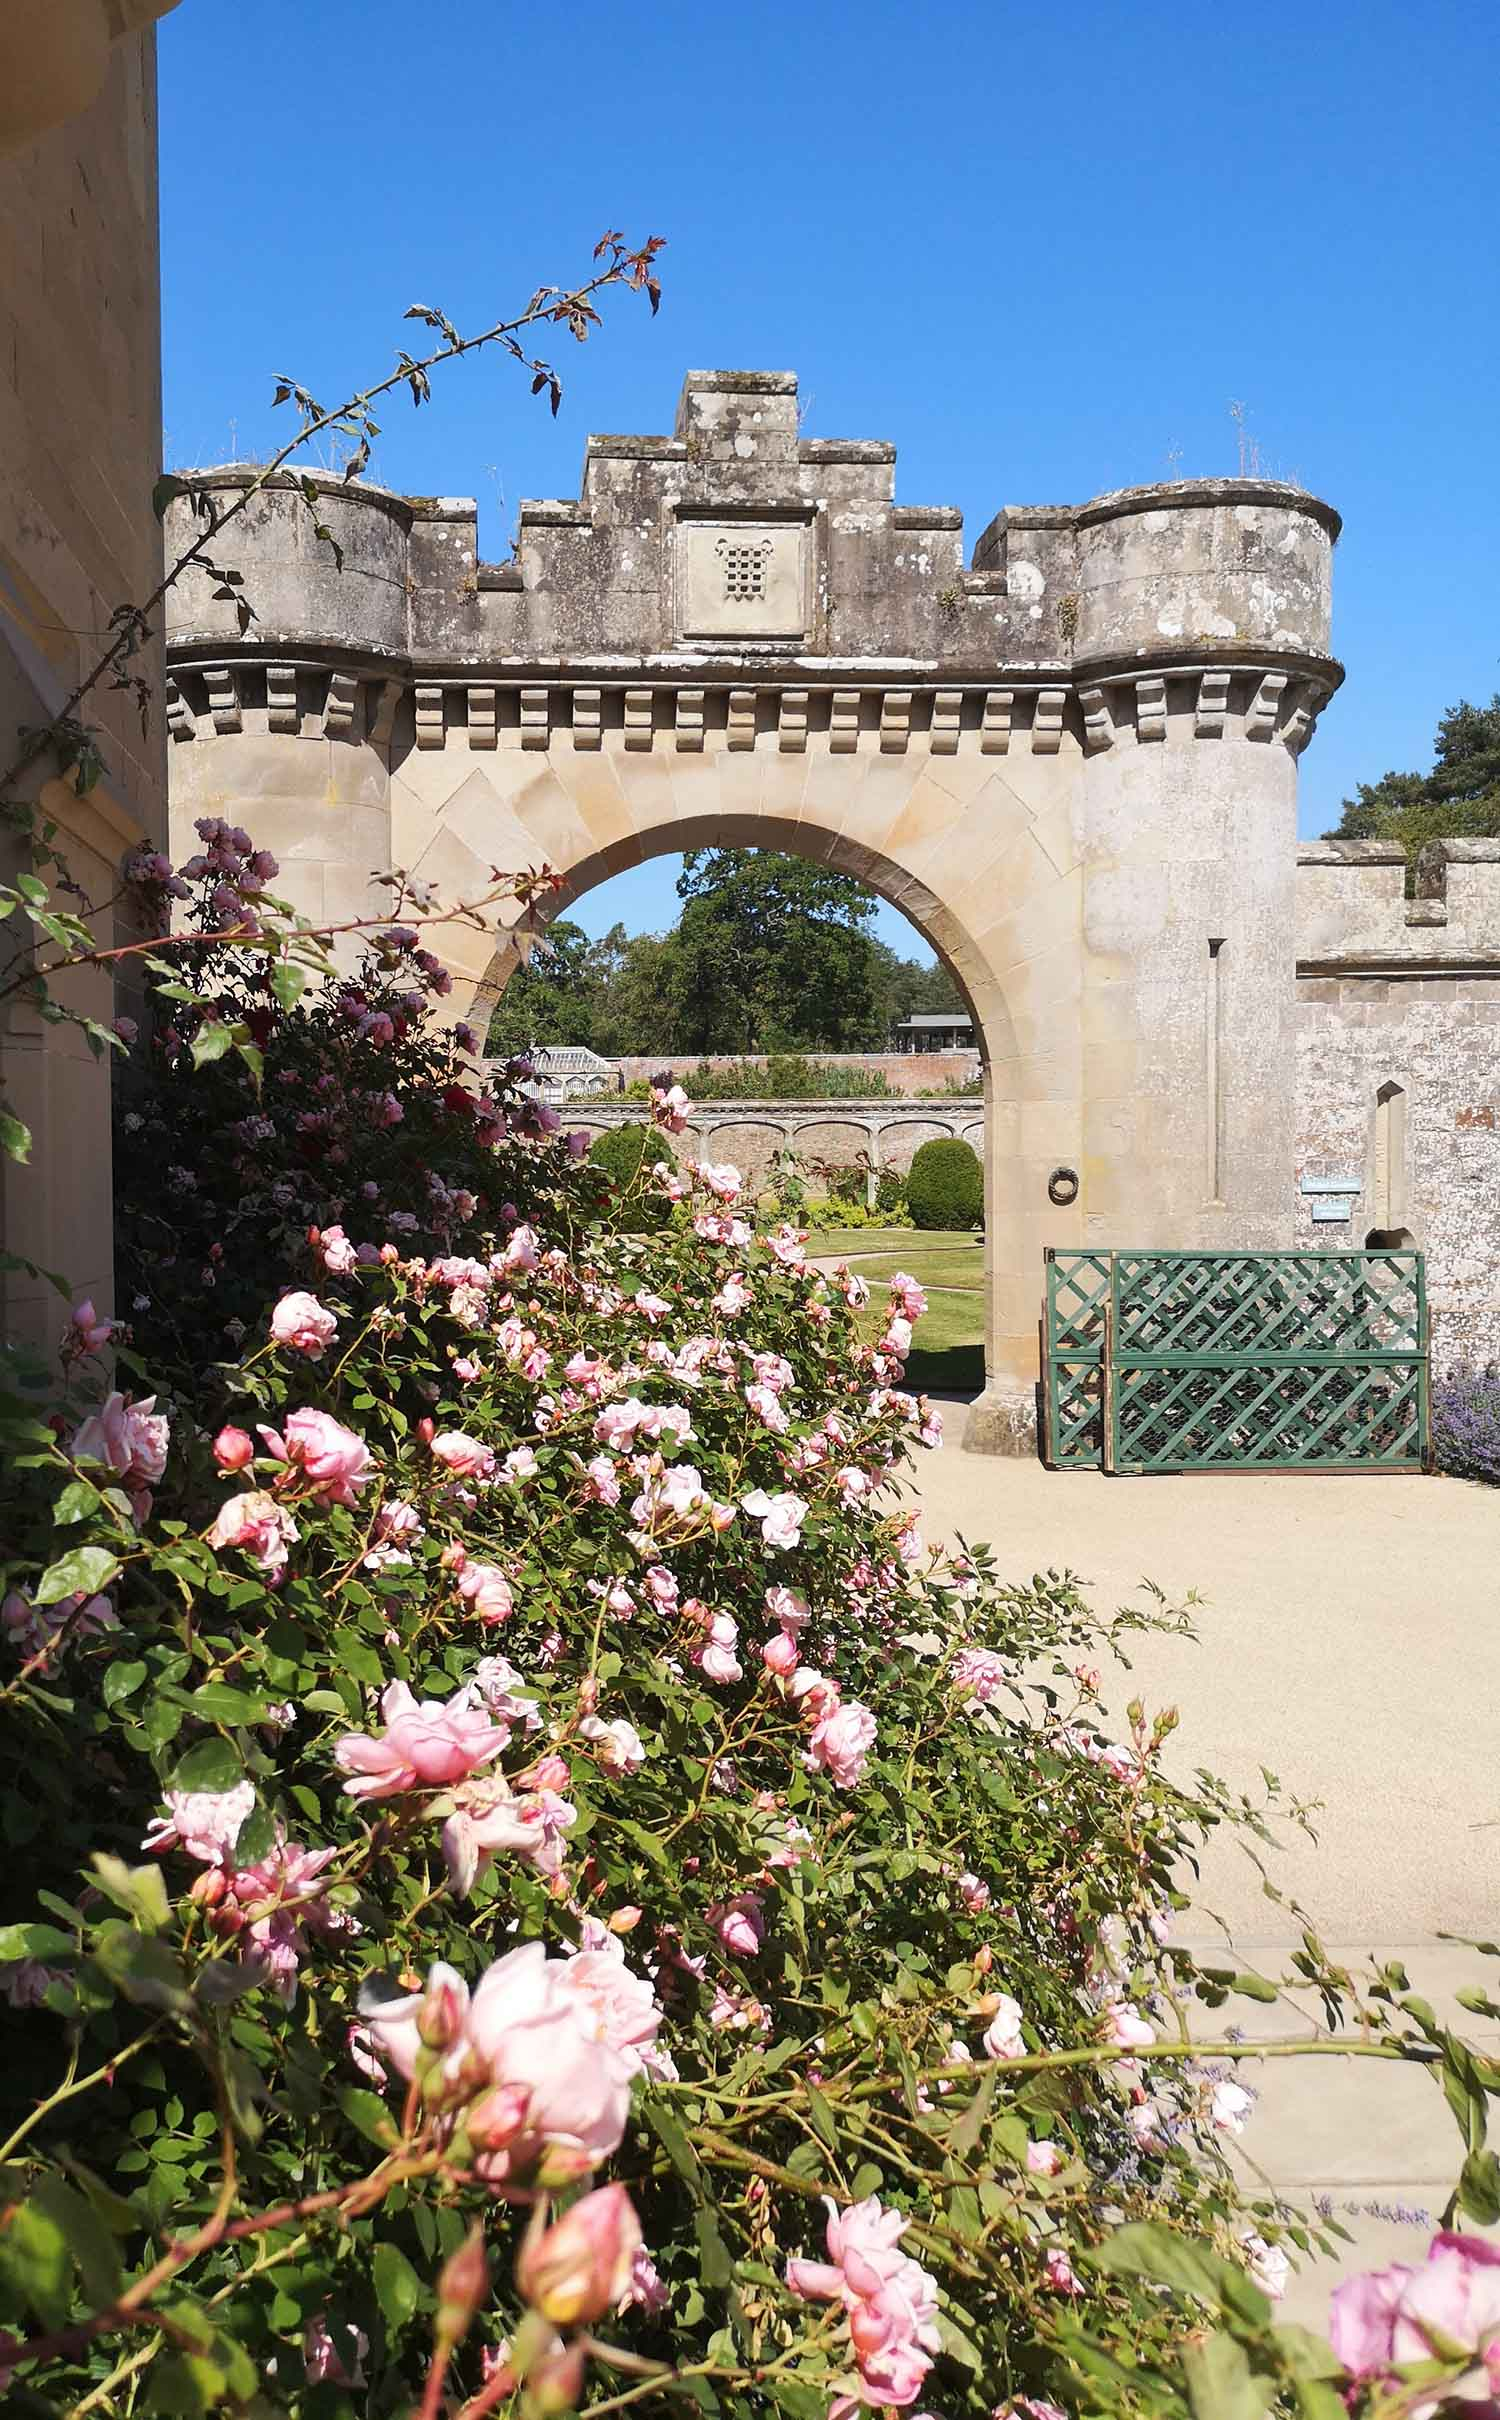 Abbotsford gardens 3.jpg